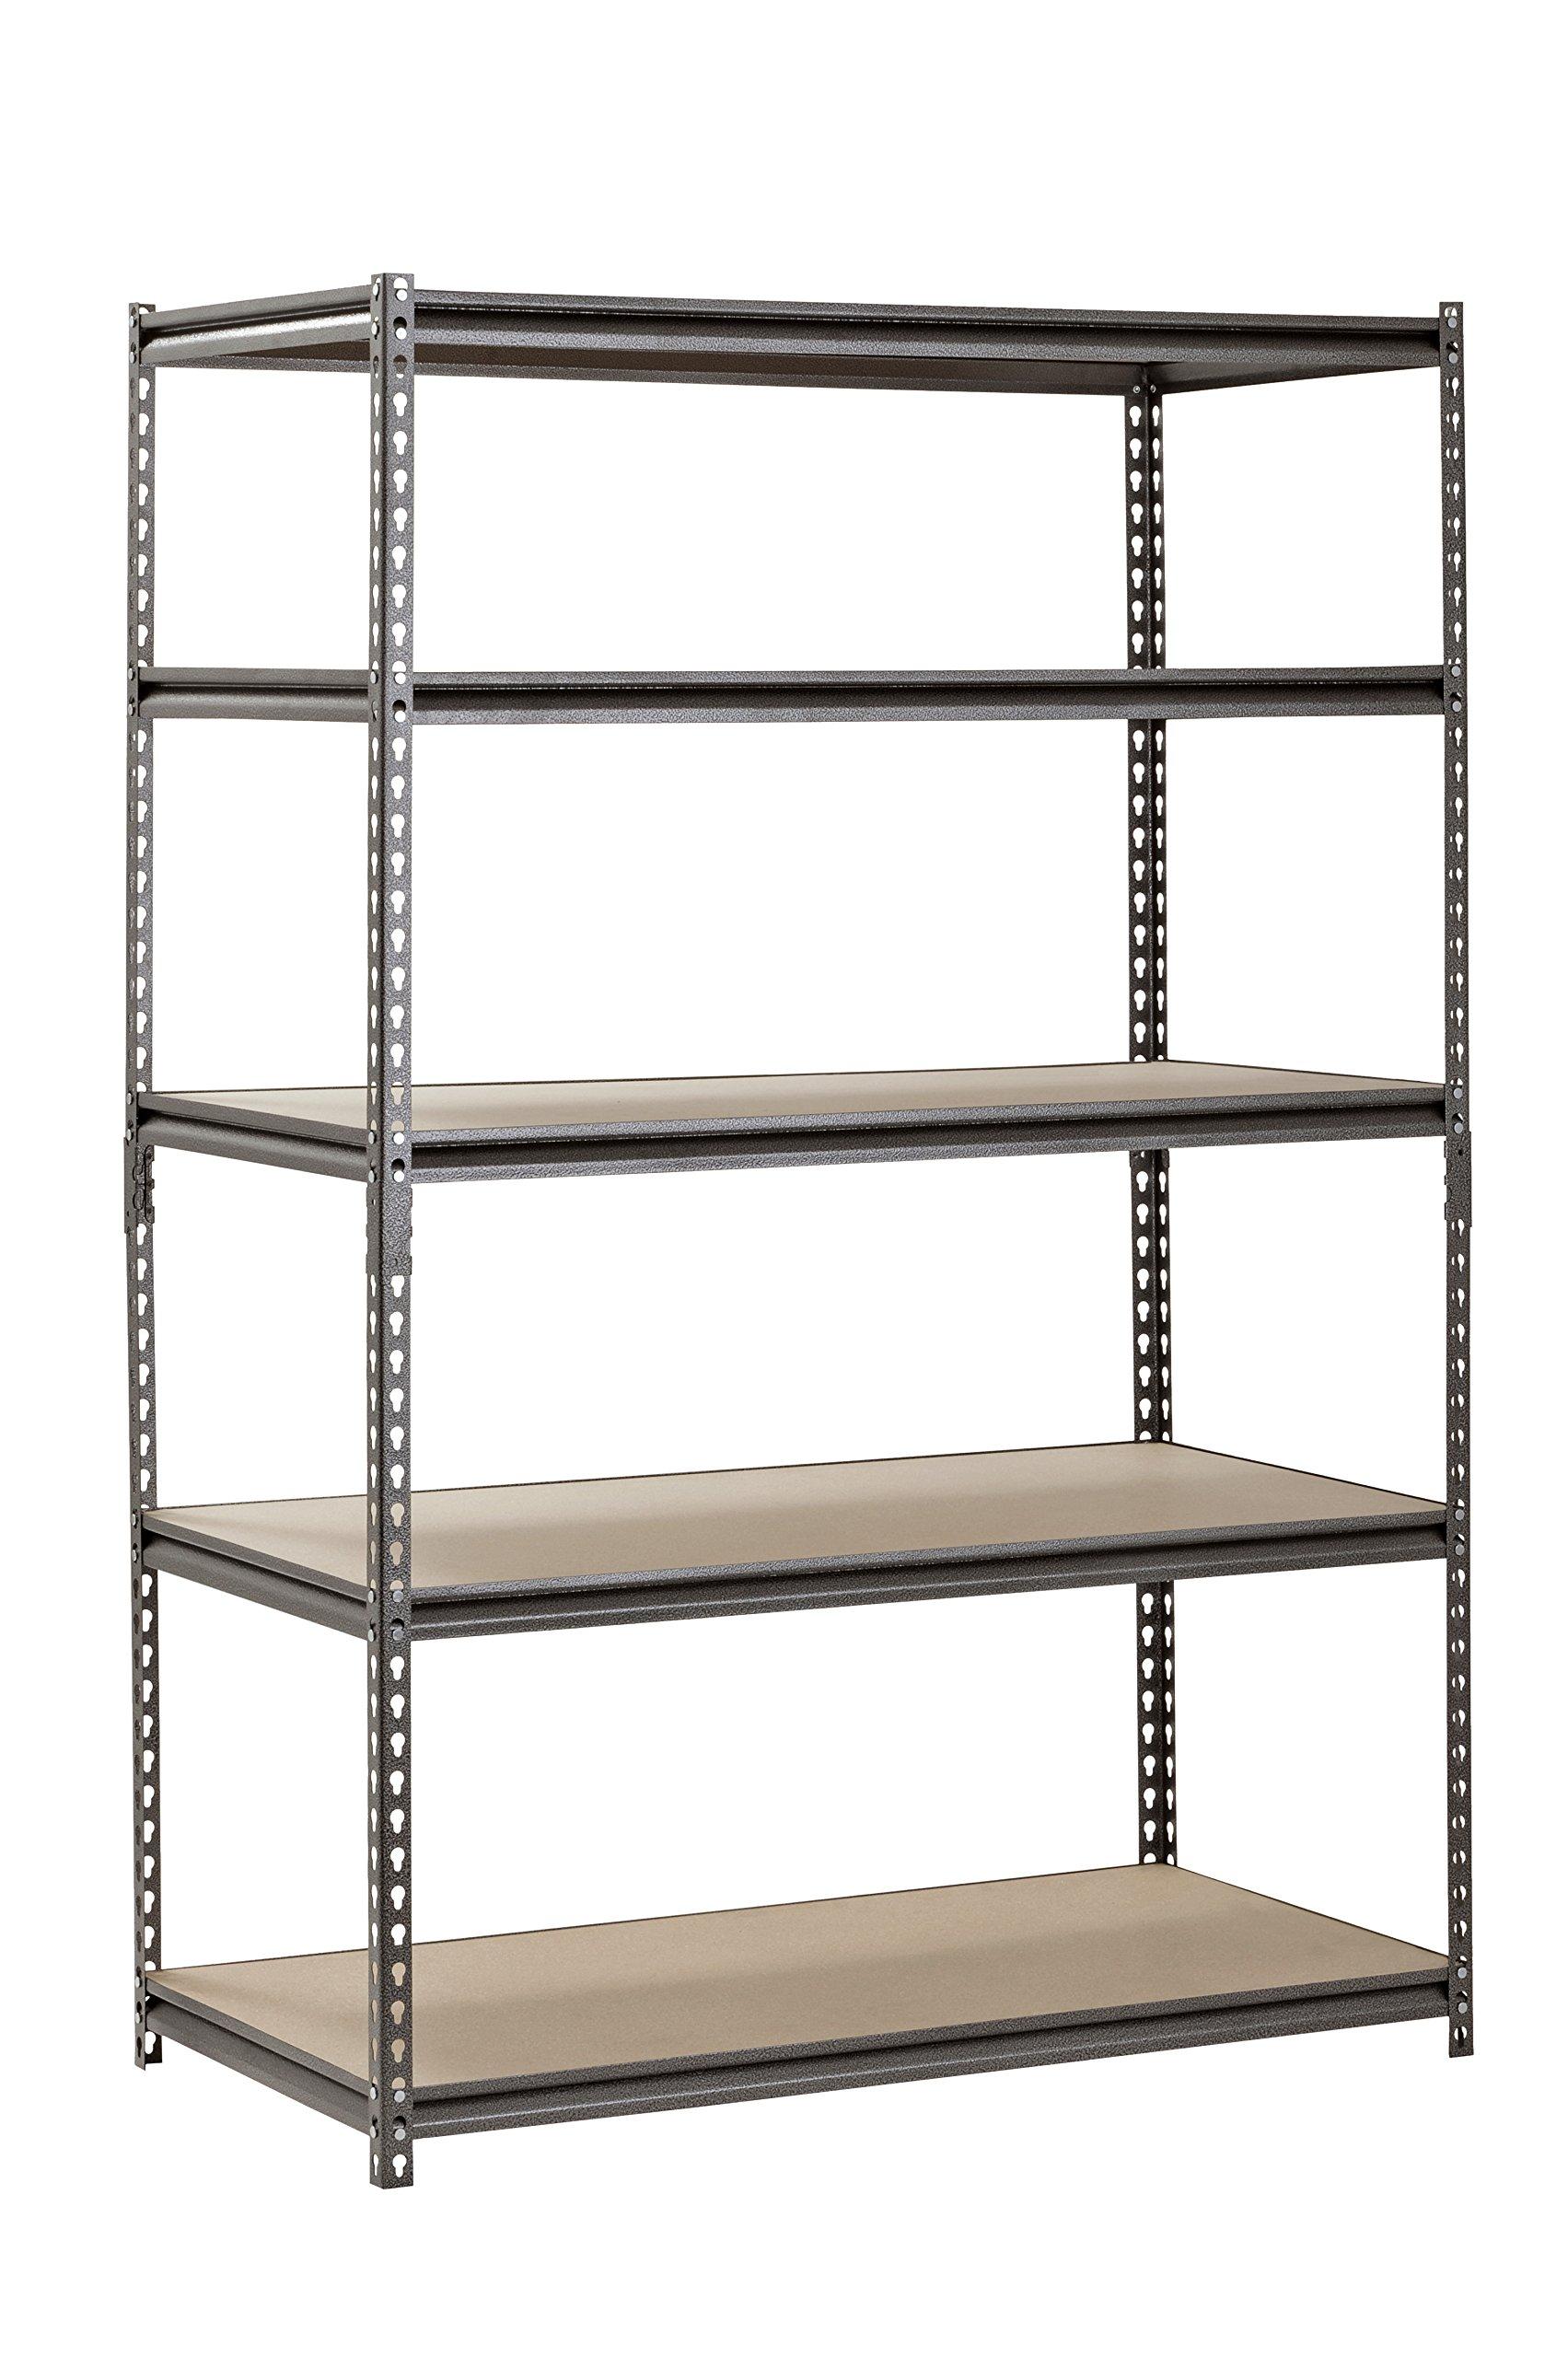 Muscle Rack UR482472PB5PAZ-SV Silver Vein Steel Storage Rack, 5 Adjustable Shelves, 4000 lb. Capacity, 72'' Height x 48'' Width x 24'' Depth